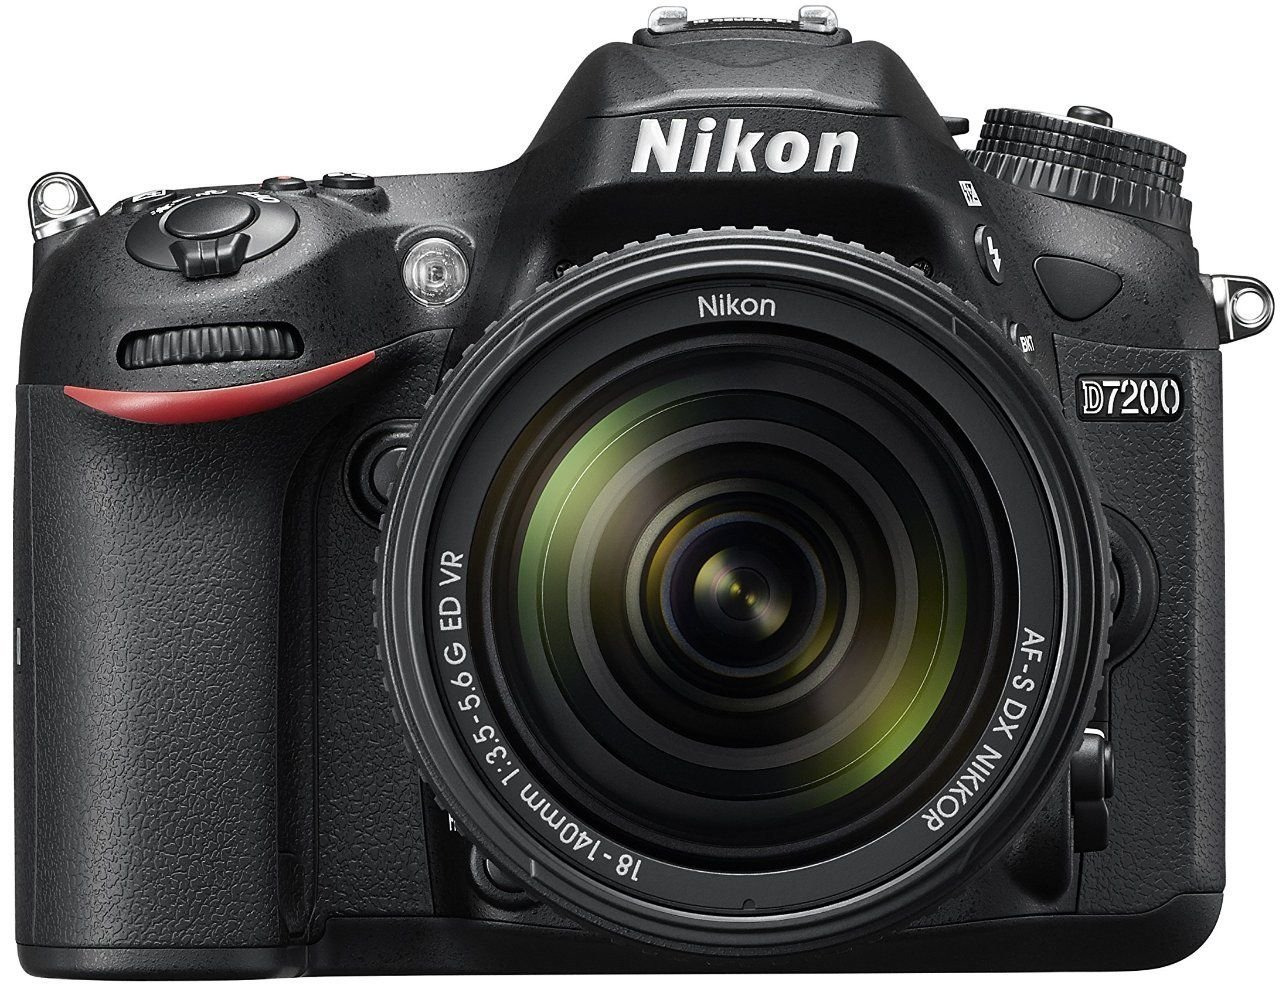 Nikon D7200 24.2 MP Digital SLR Camera